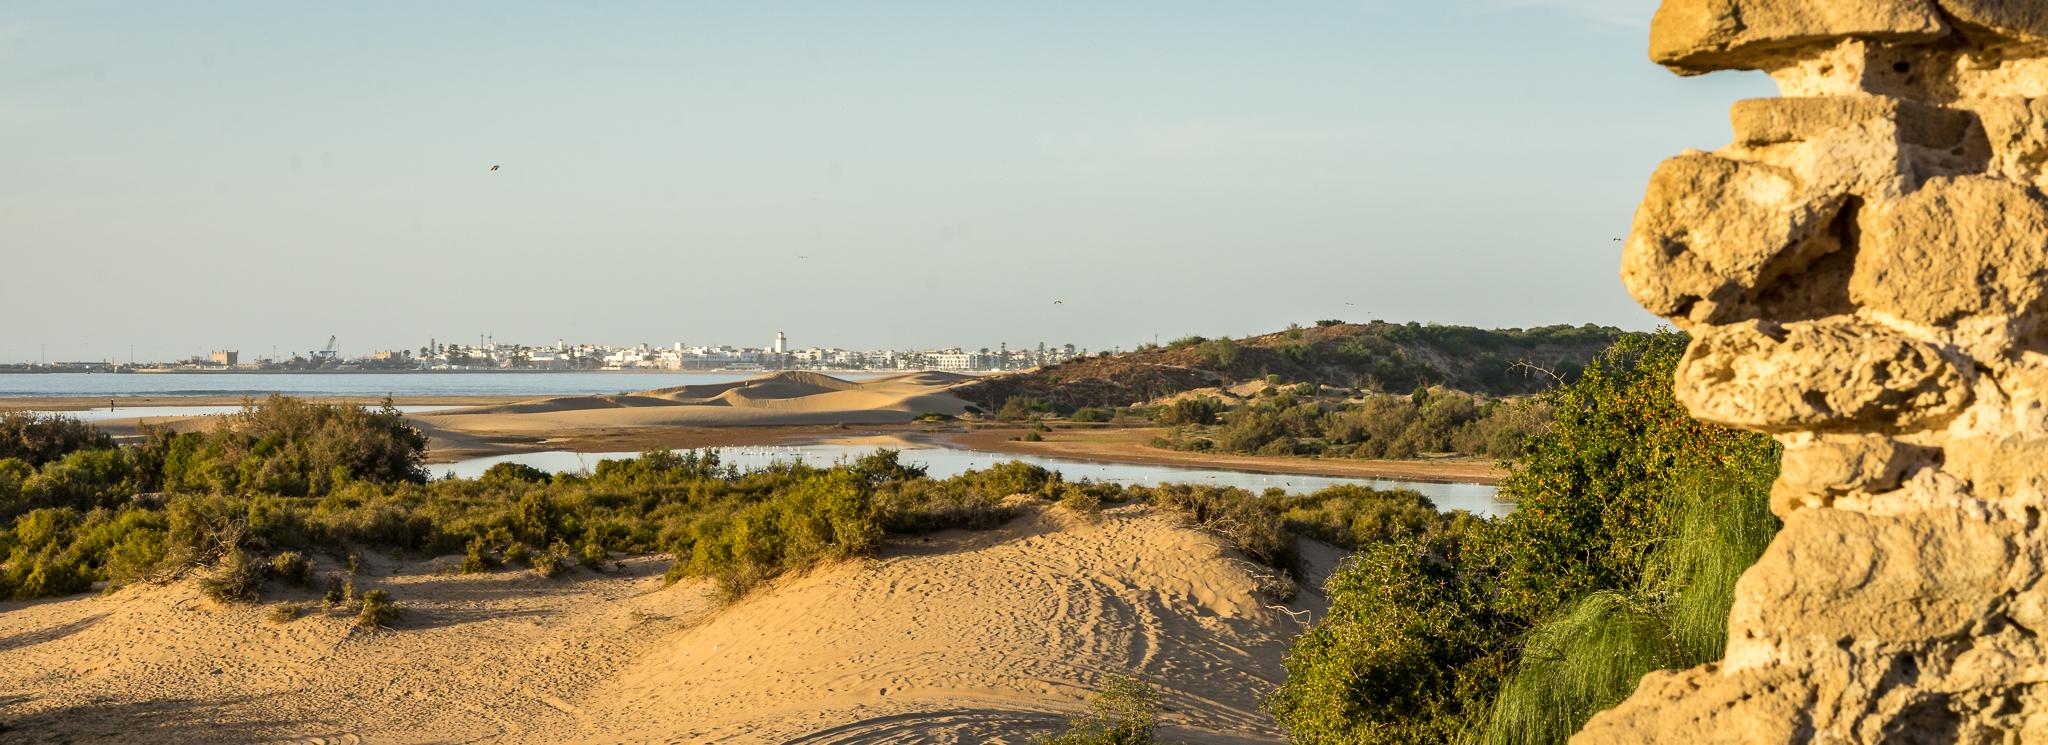 Marokko VIII: Die Küste entlang nach Essaouira